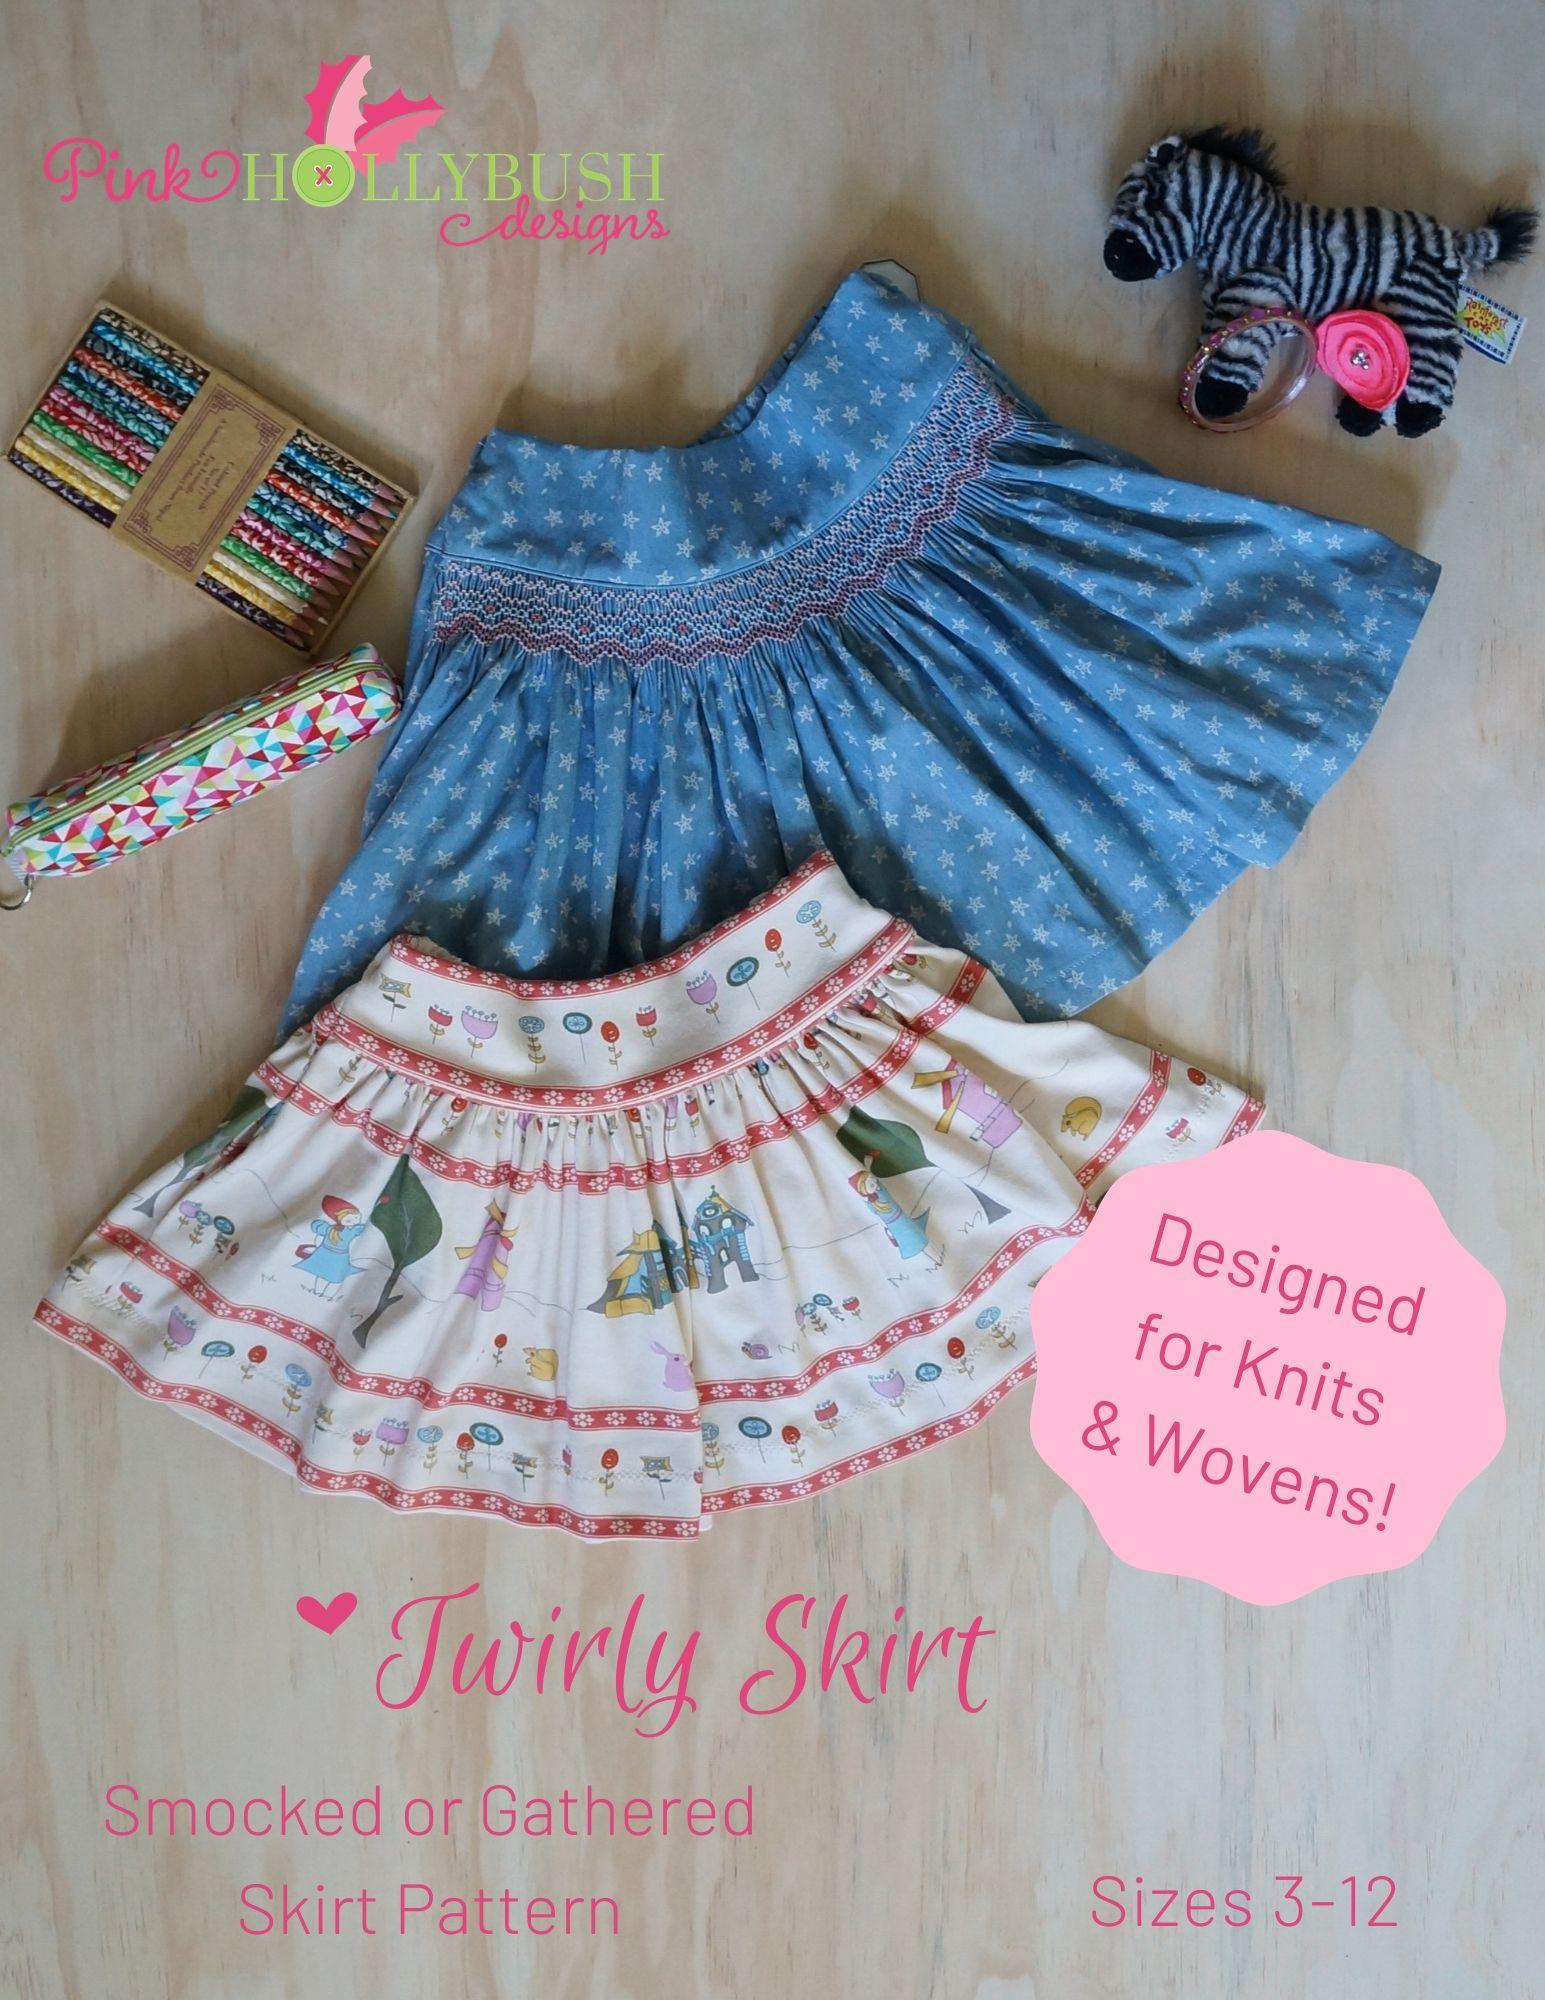 Twirly Skirt Course